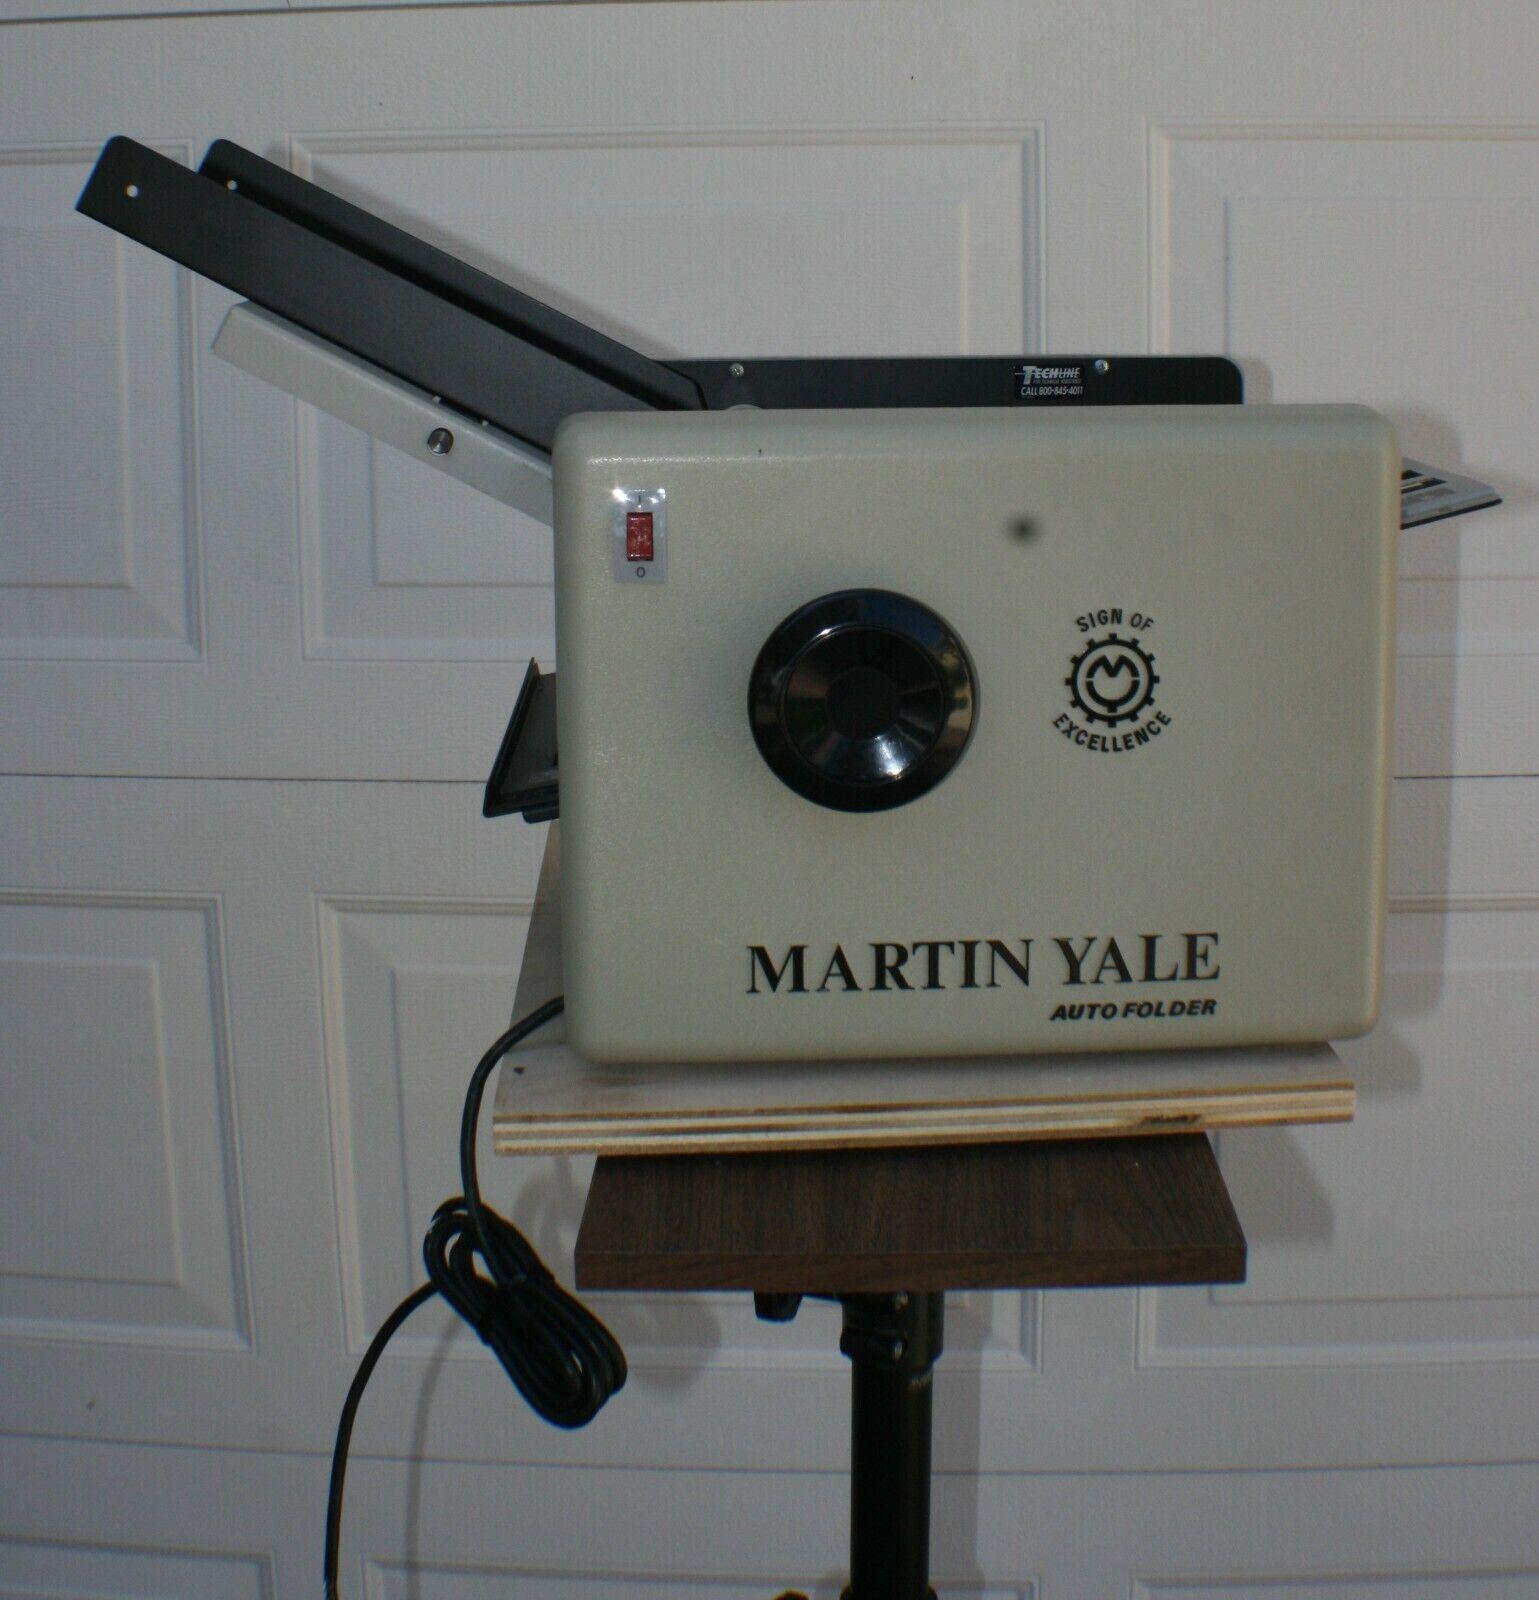 Martin Yale 1501x0 Automatic Paper Folder Auto Folding Machine 1501x 1501 For Sale Online Ebay